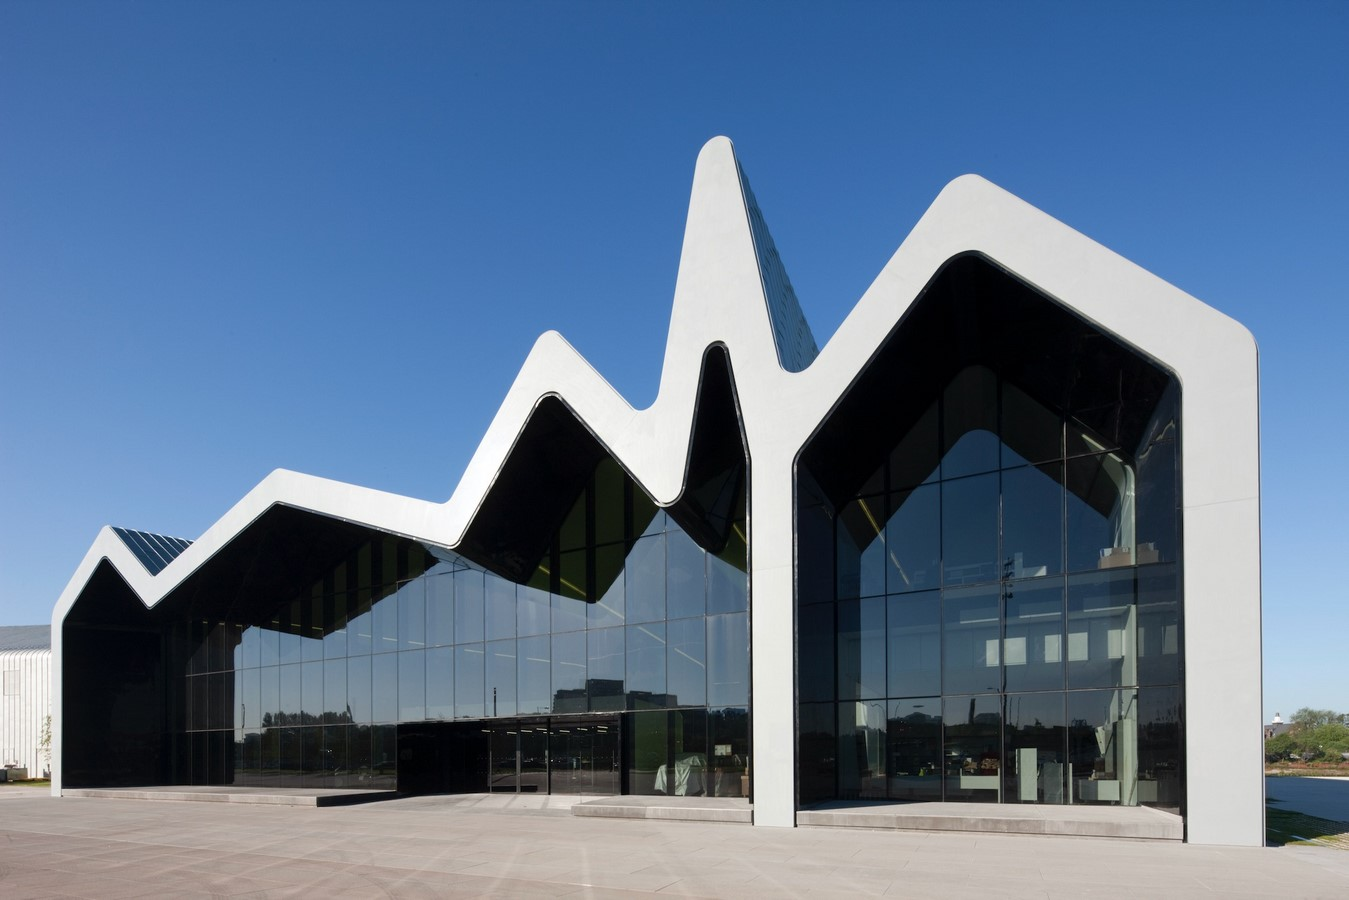 Glasgow Riverside Museum of Transport by Zaha Hadid : The Zig-Zag Profile - Sheet3